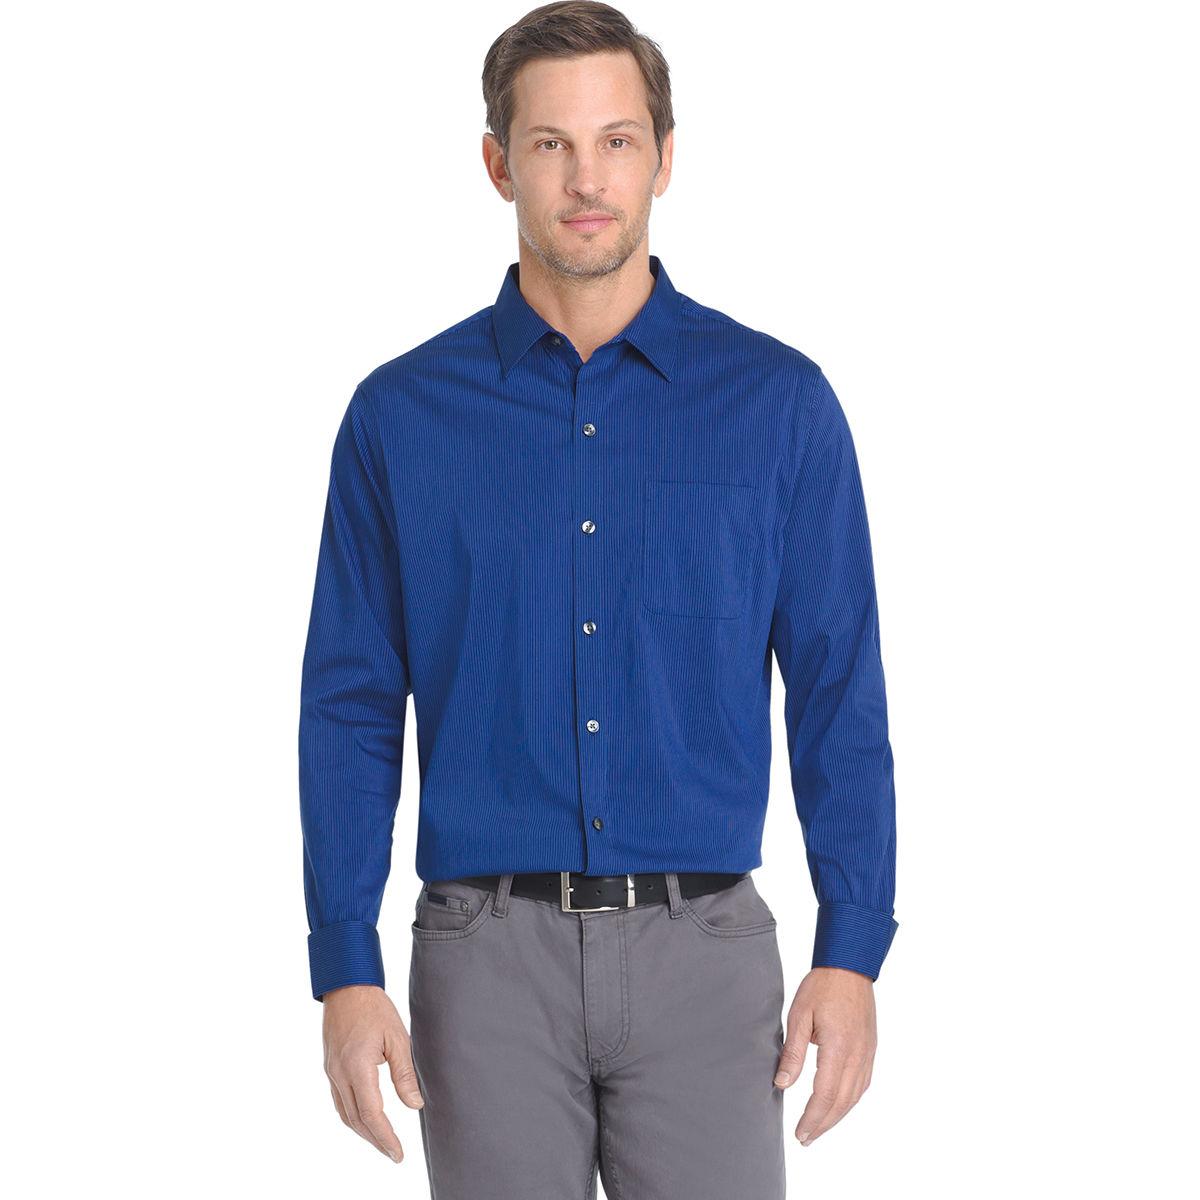 Van Heusen Men's Traveler Stripe Woven Long-Sleeve Shirt - Blue, L